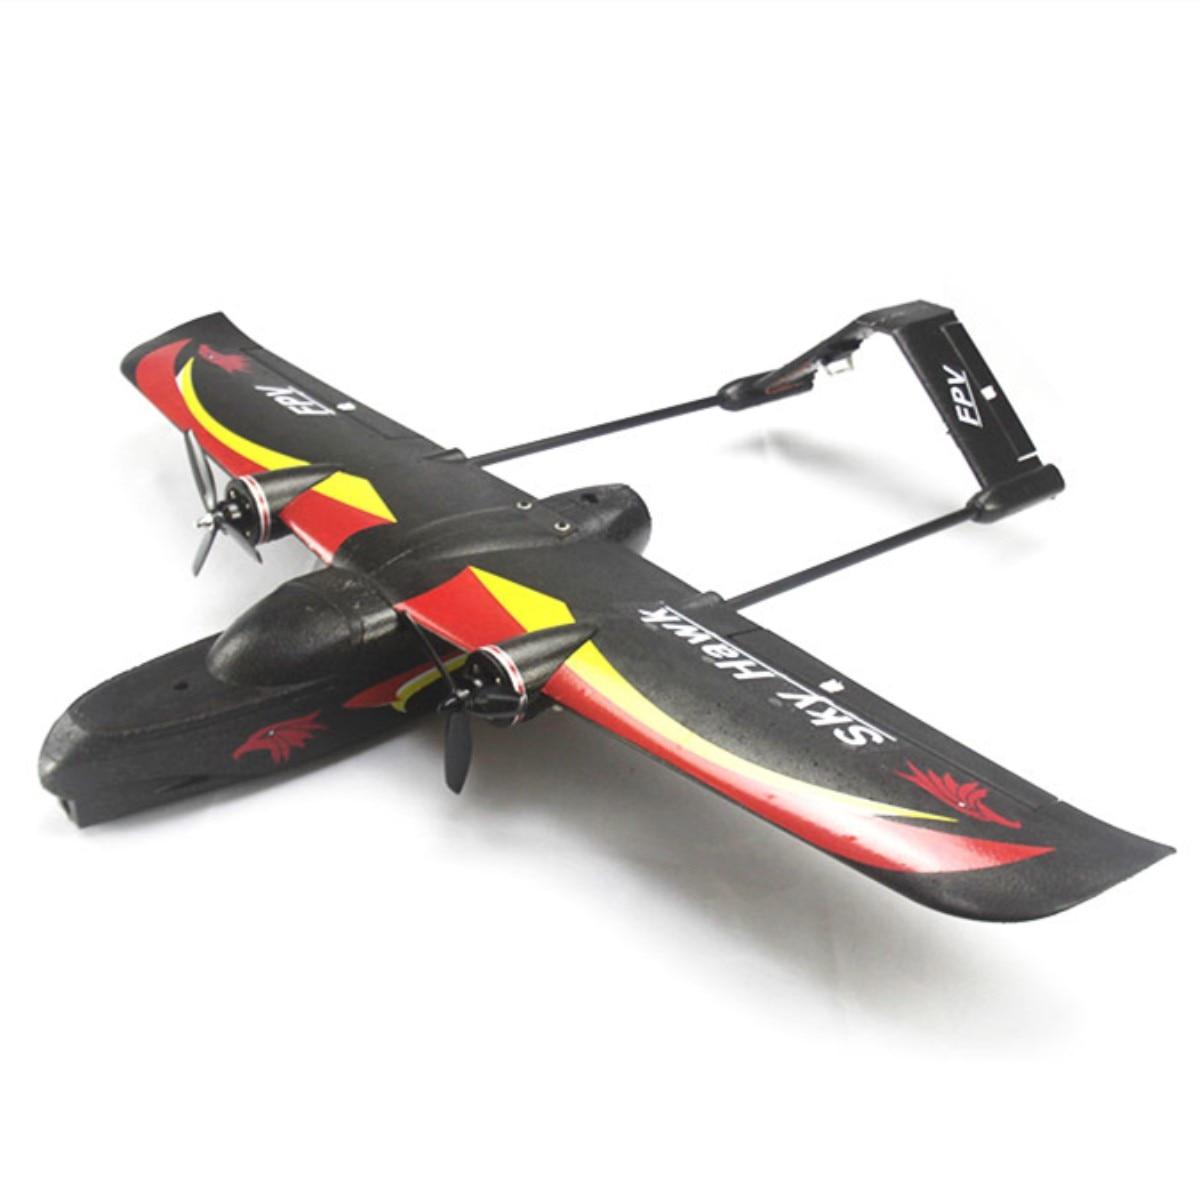 SKY HAWK V2 940mm Wingspan EPP Double Motor Device FPV RC Airplane Kit/PNP Black Electric RC Glider